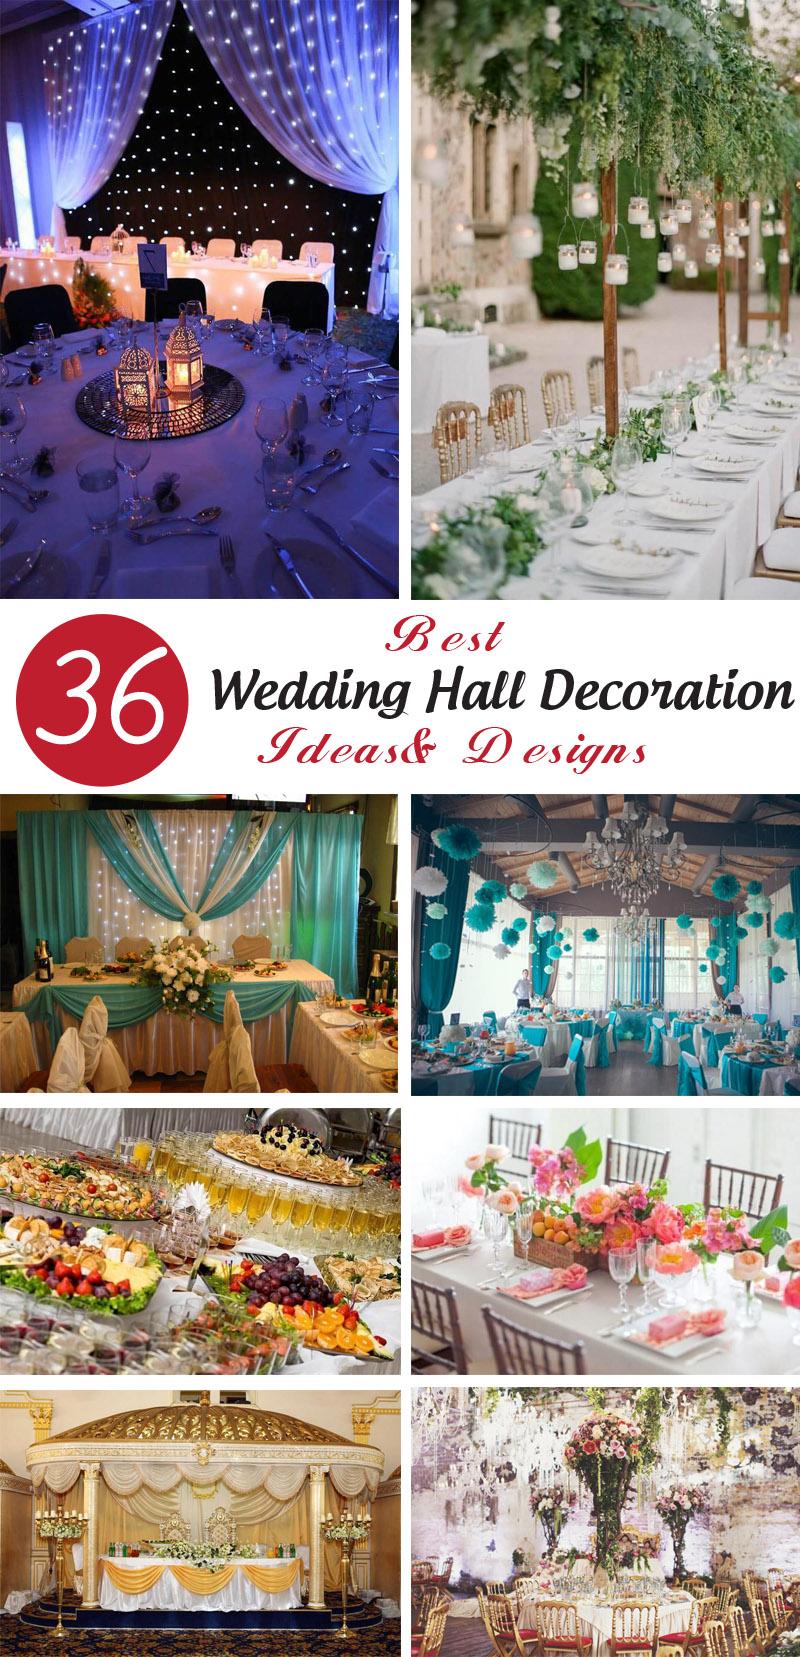 BEST WEDDING HALL DECORATION IDEAS